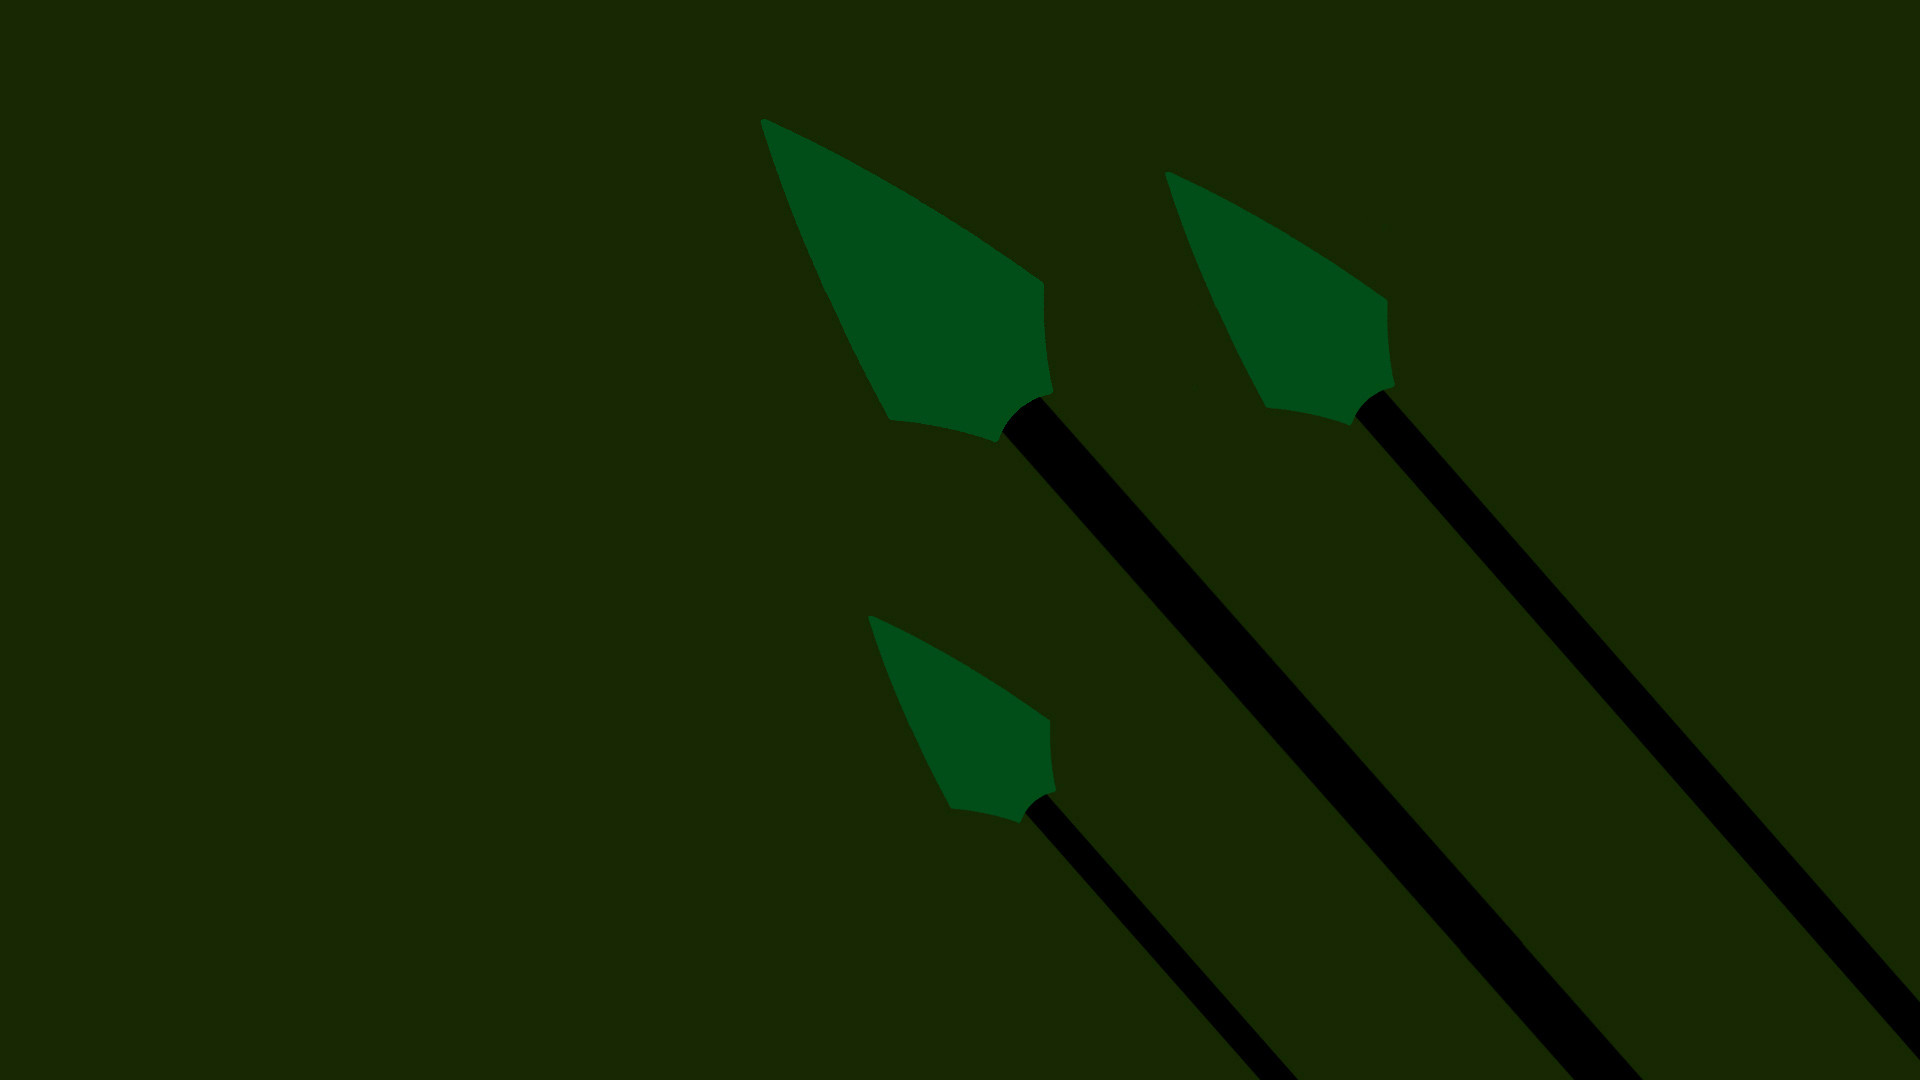 Green Arrow Wallpaper-7